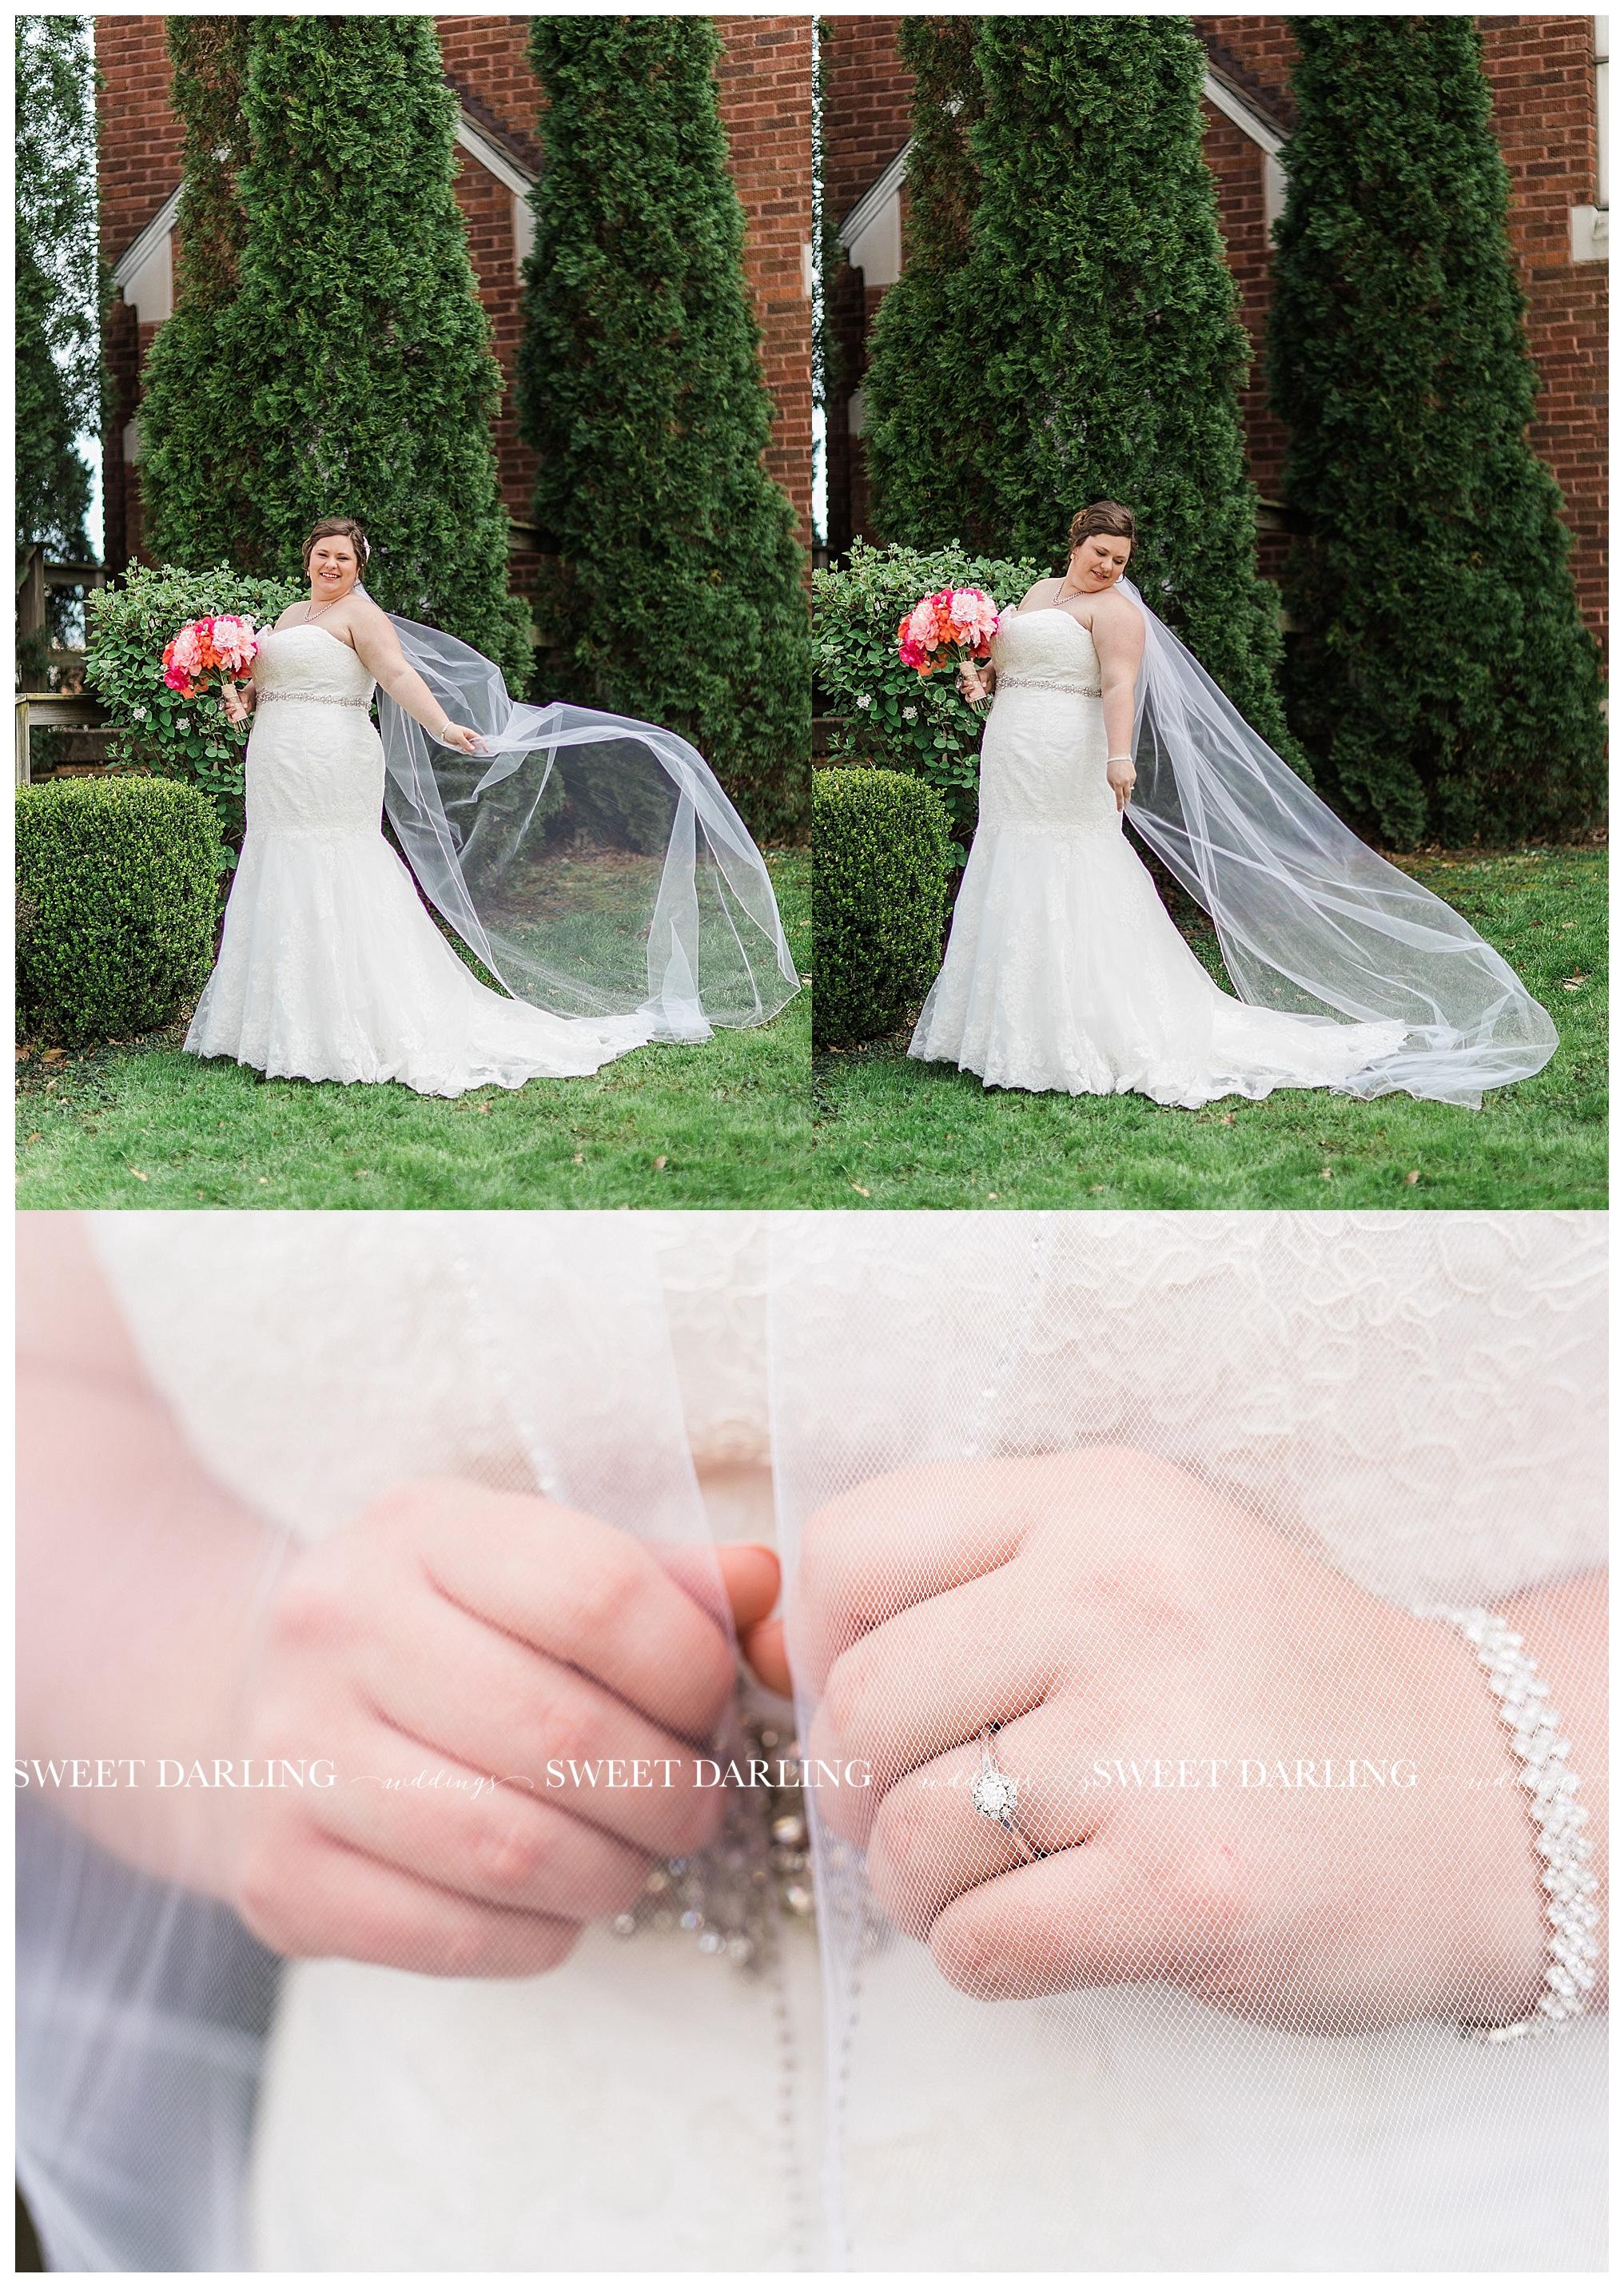 arcoloa-illinois-coles-county-wedding-photography-sweet-darling-weddings-photographer_0942.jpg